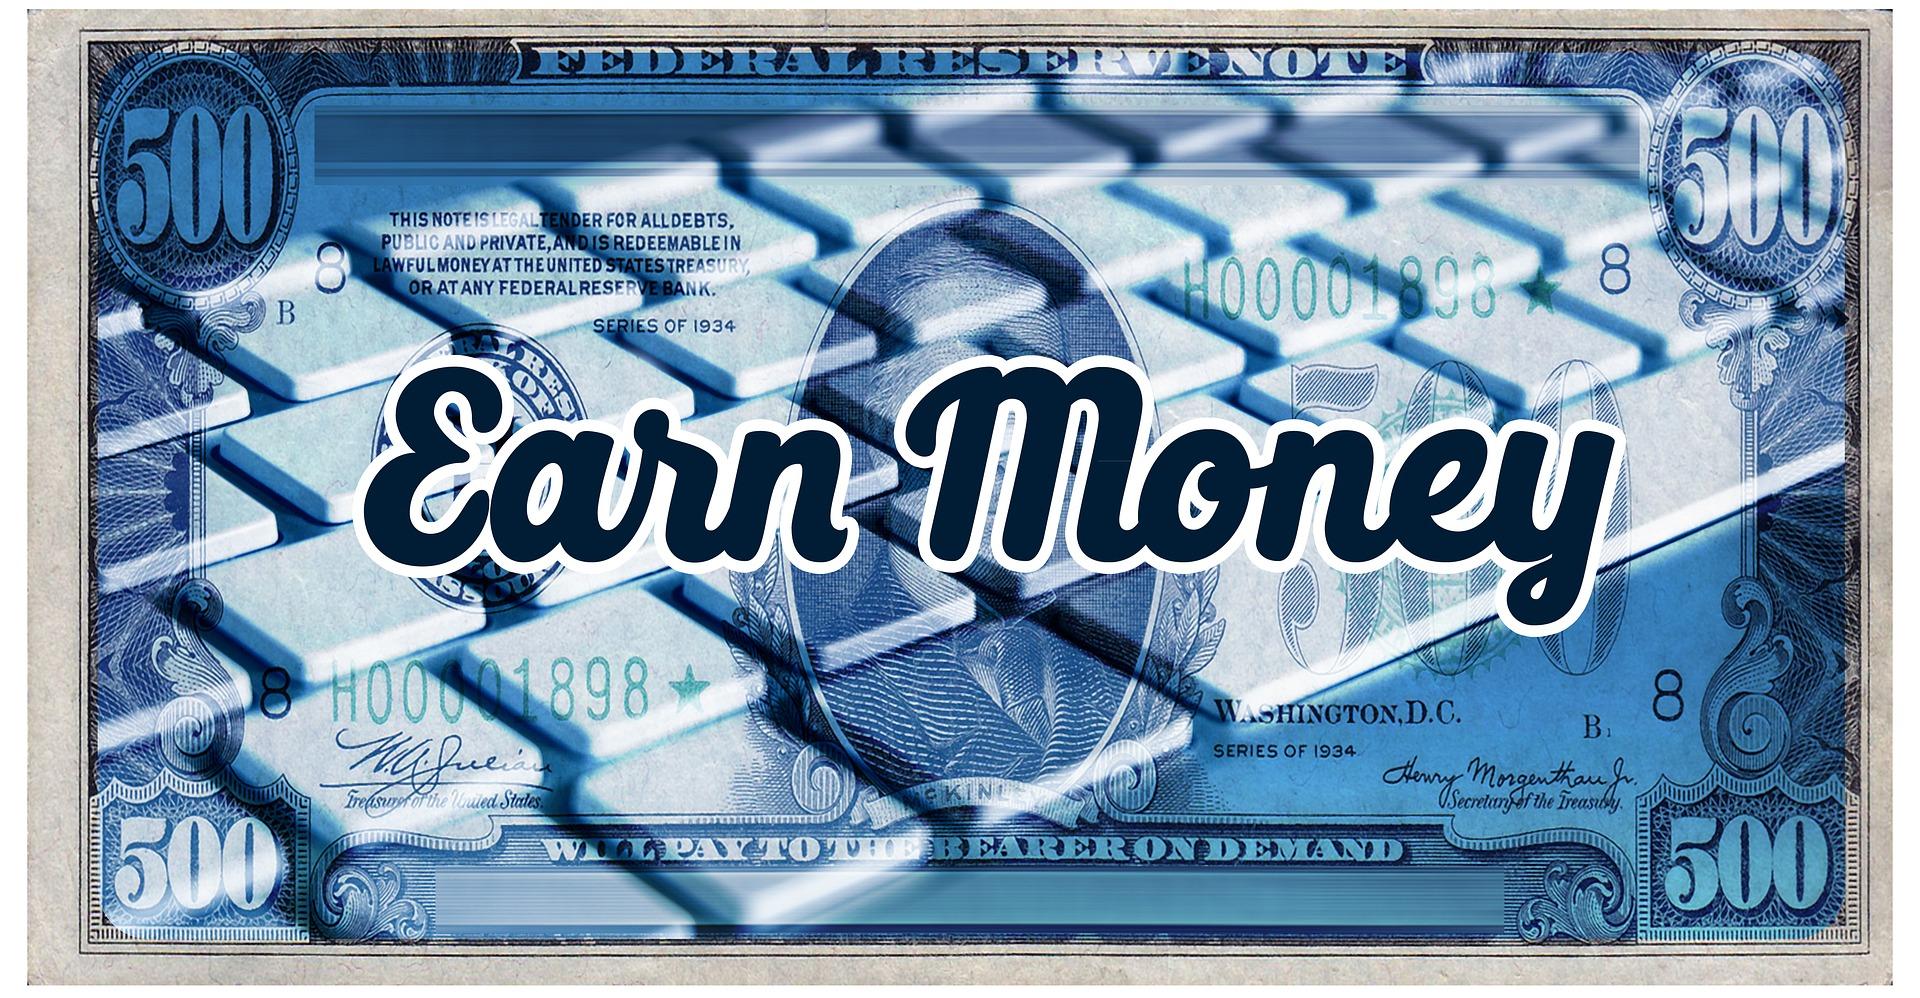 affiliate marketing opportunities earn money online